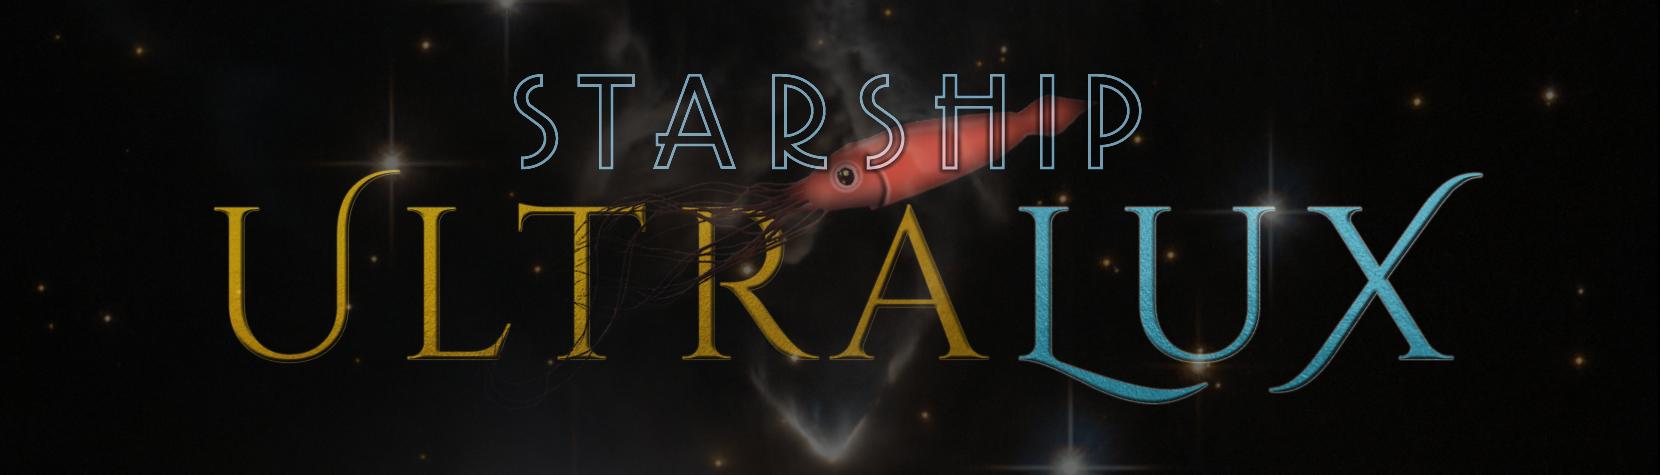 Starship UltraLux